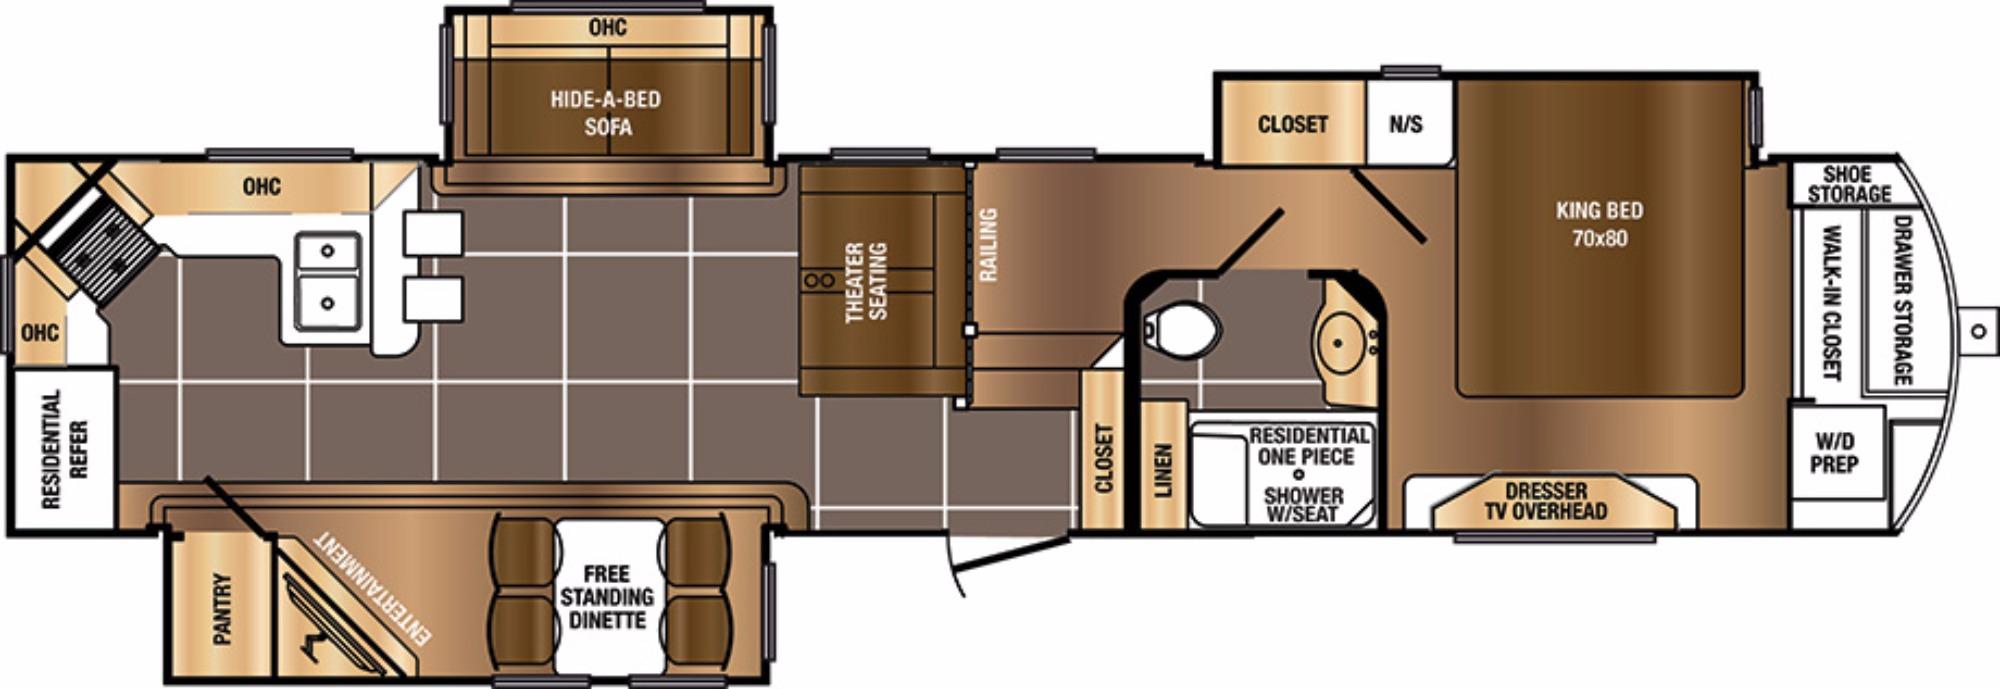 View Floor Plan for 2017 PRIME TIME SANIBEL 3701